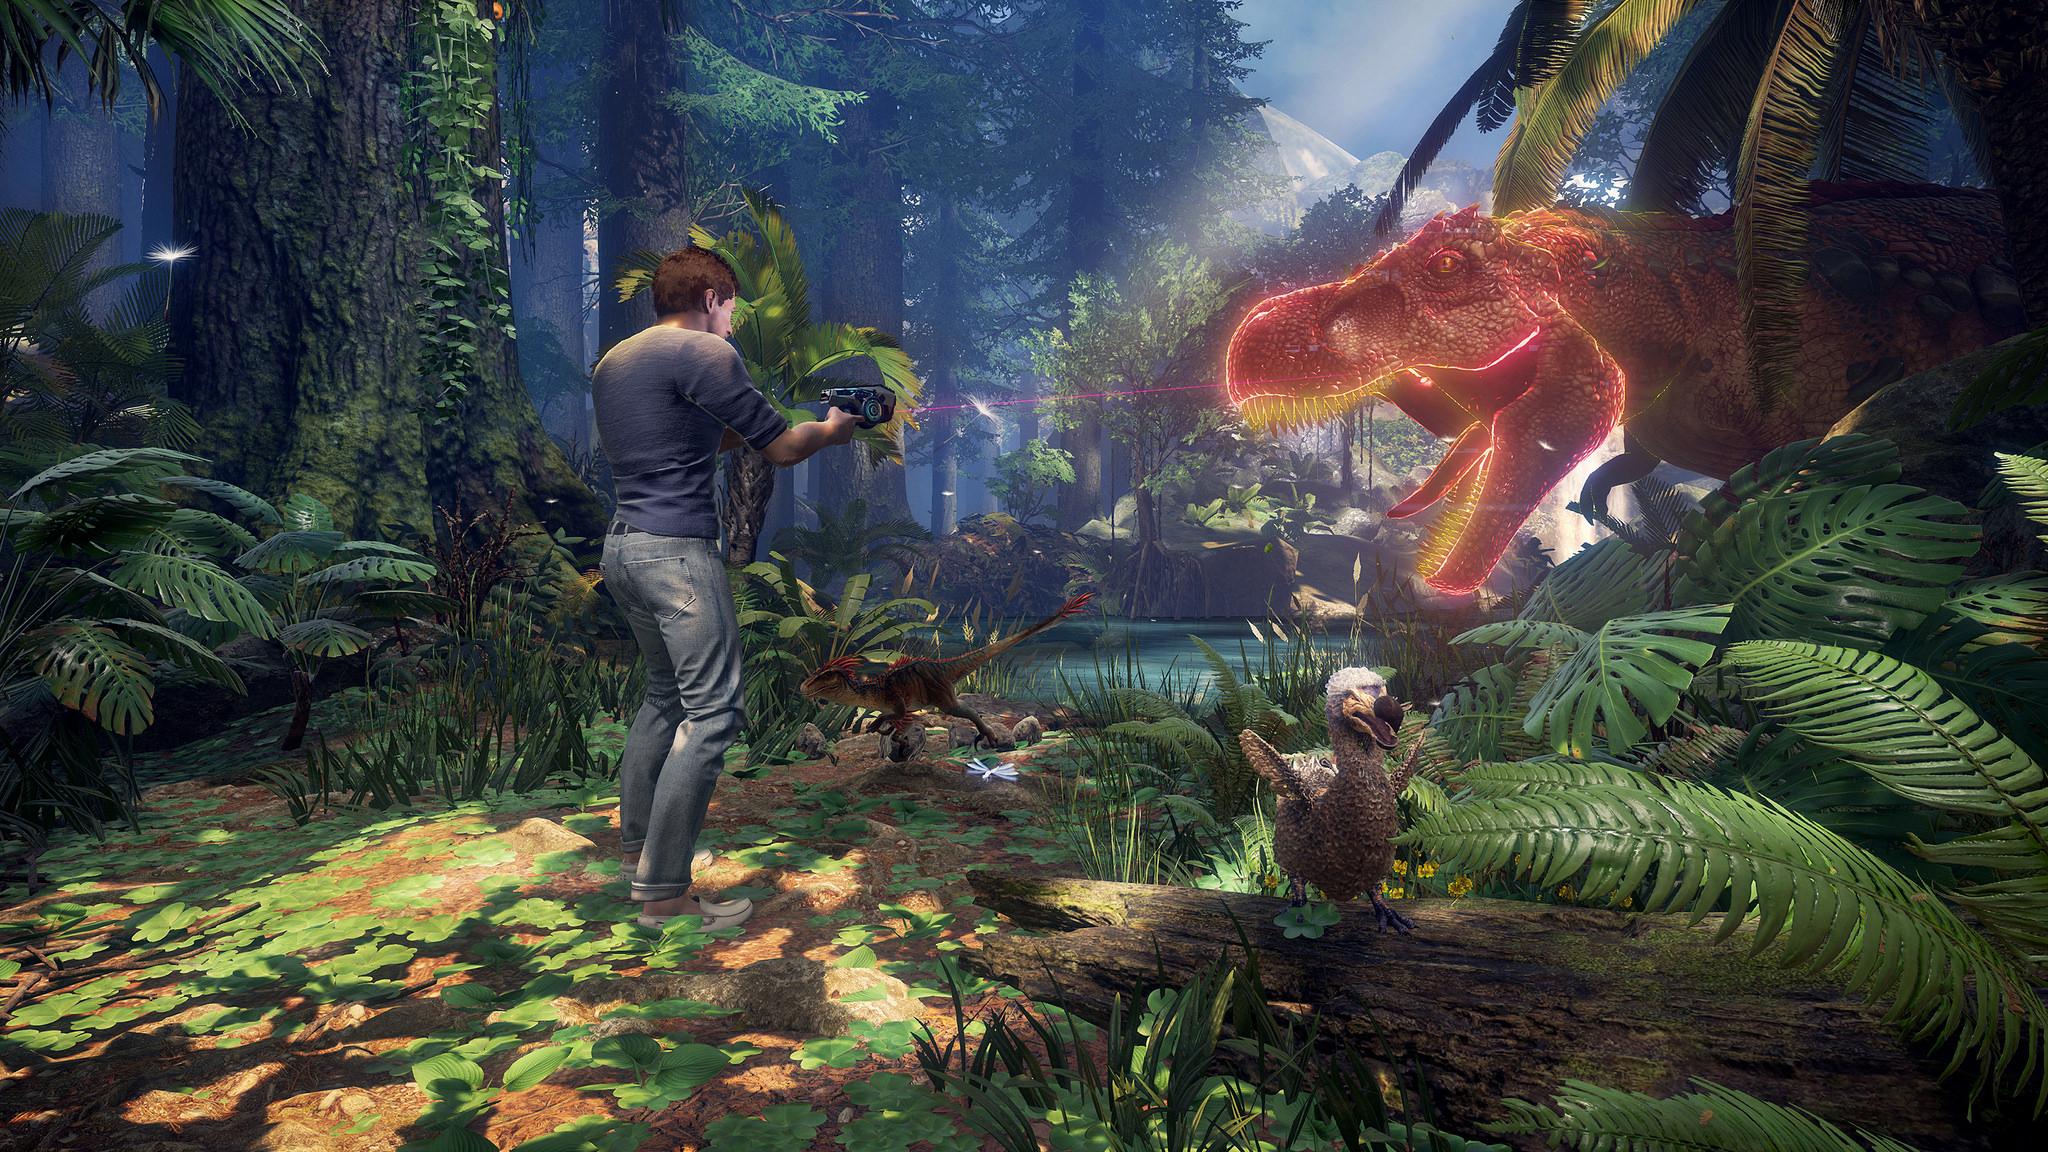 ARK-Park-Oculus-Rift-HTC-Vive-PlayStationVR-PSVR-SteamVR